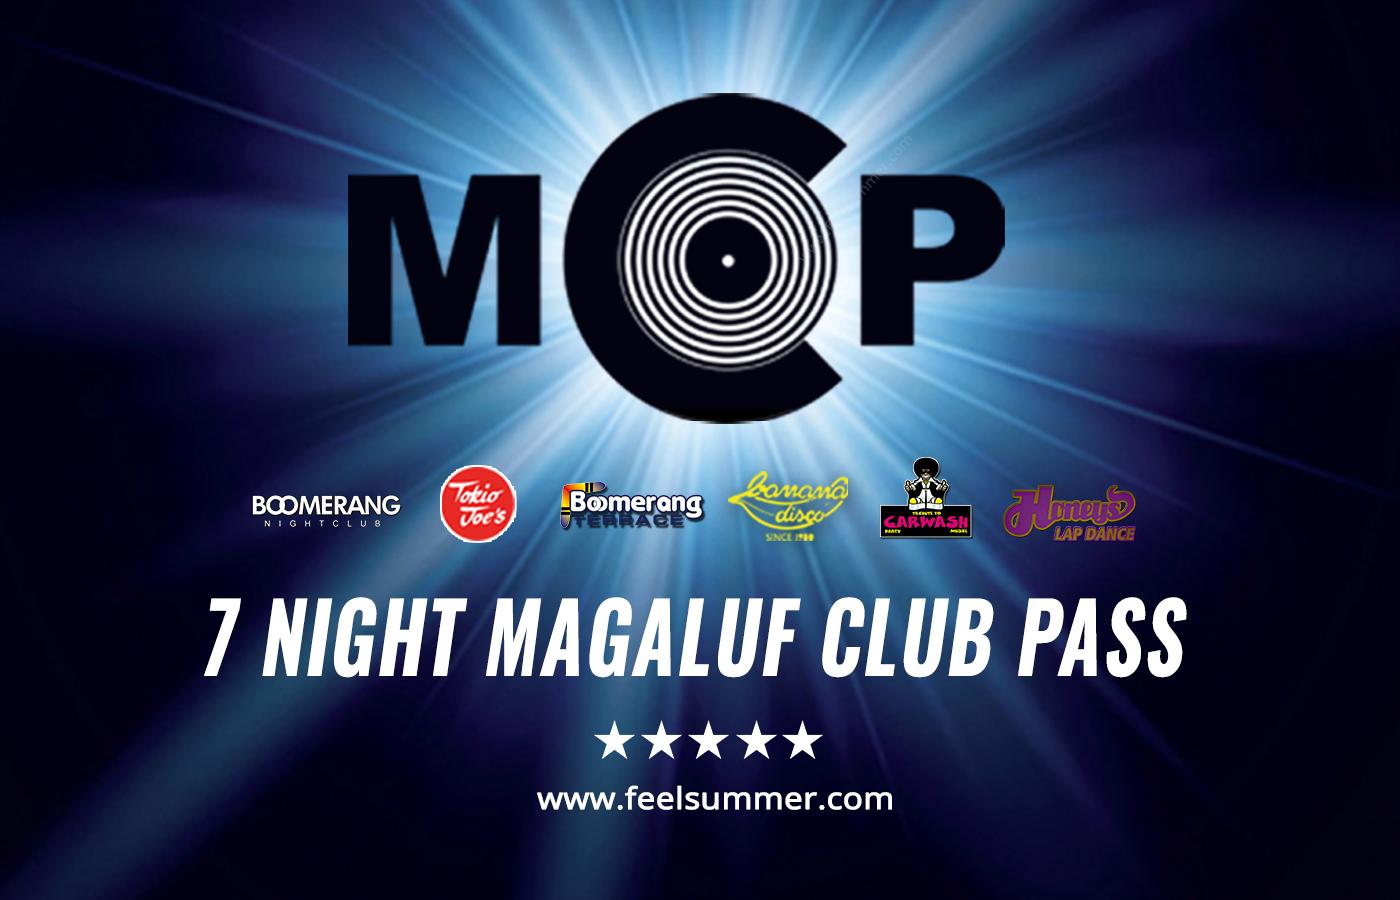 MAGALUF-CLUB-PASS-2022-HIGHT-SEASON